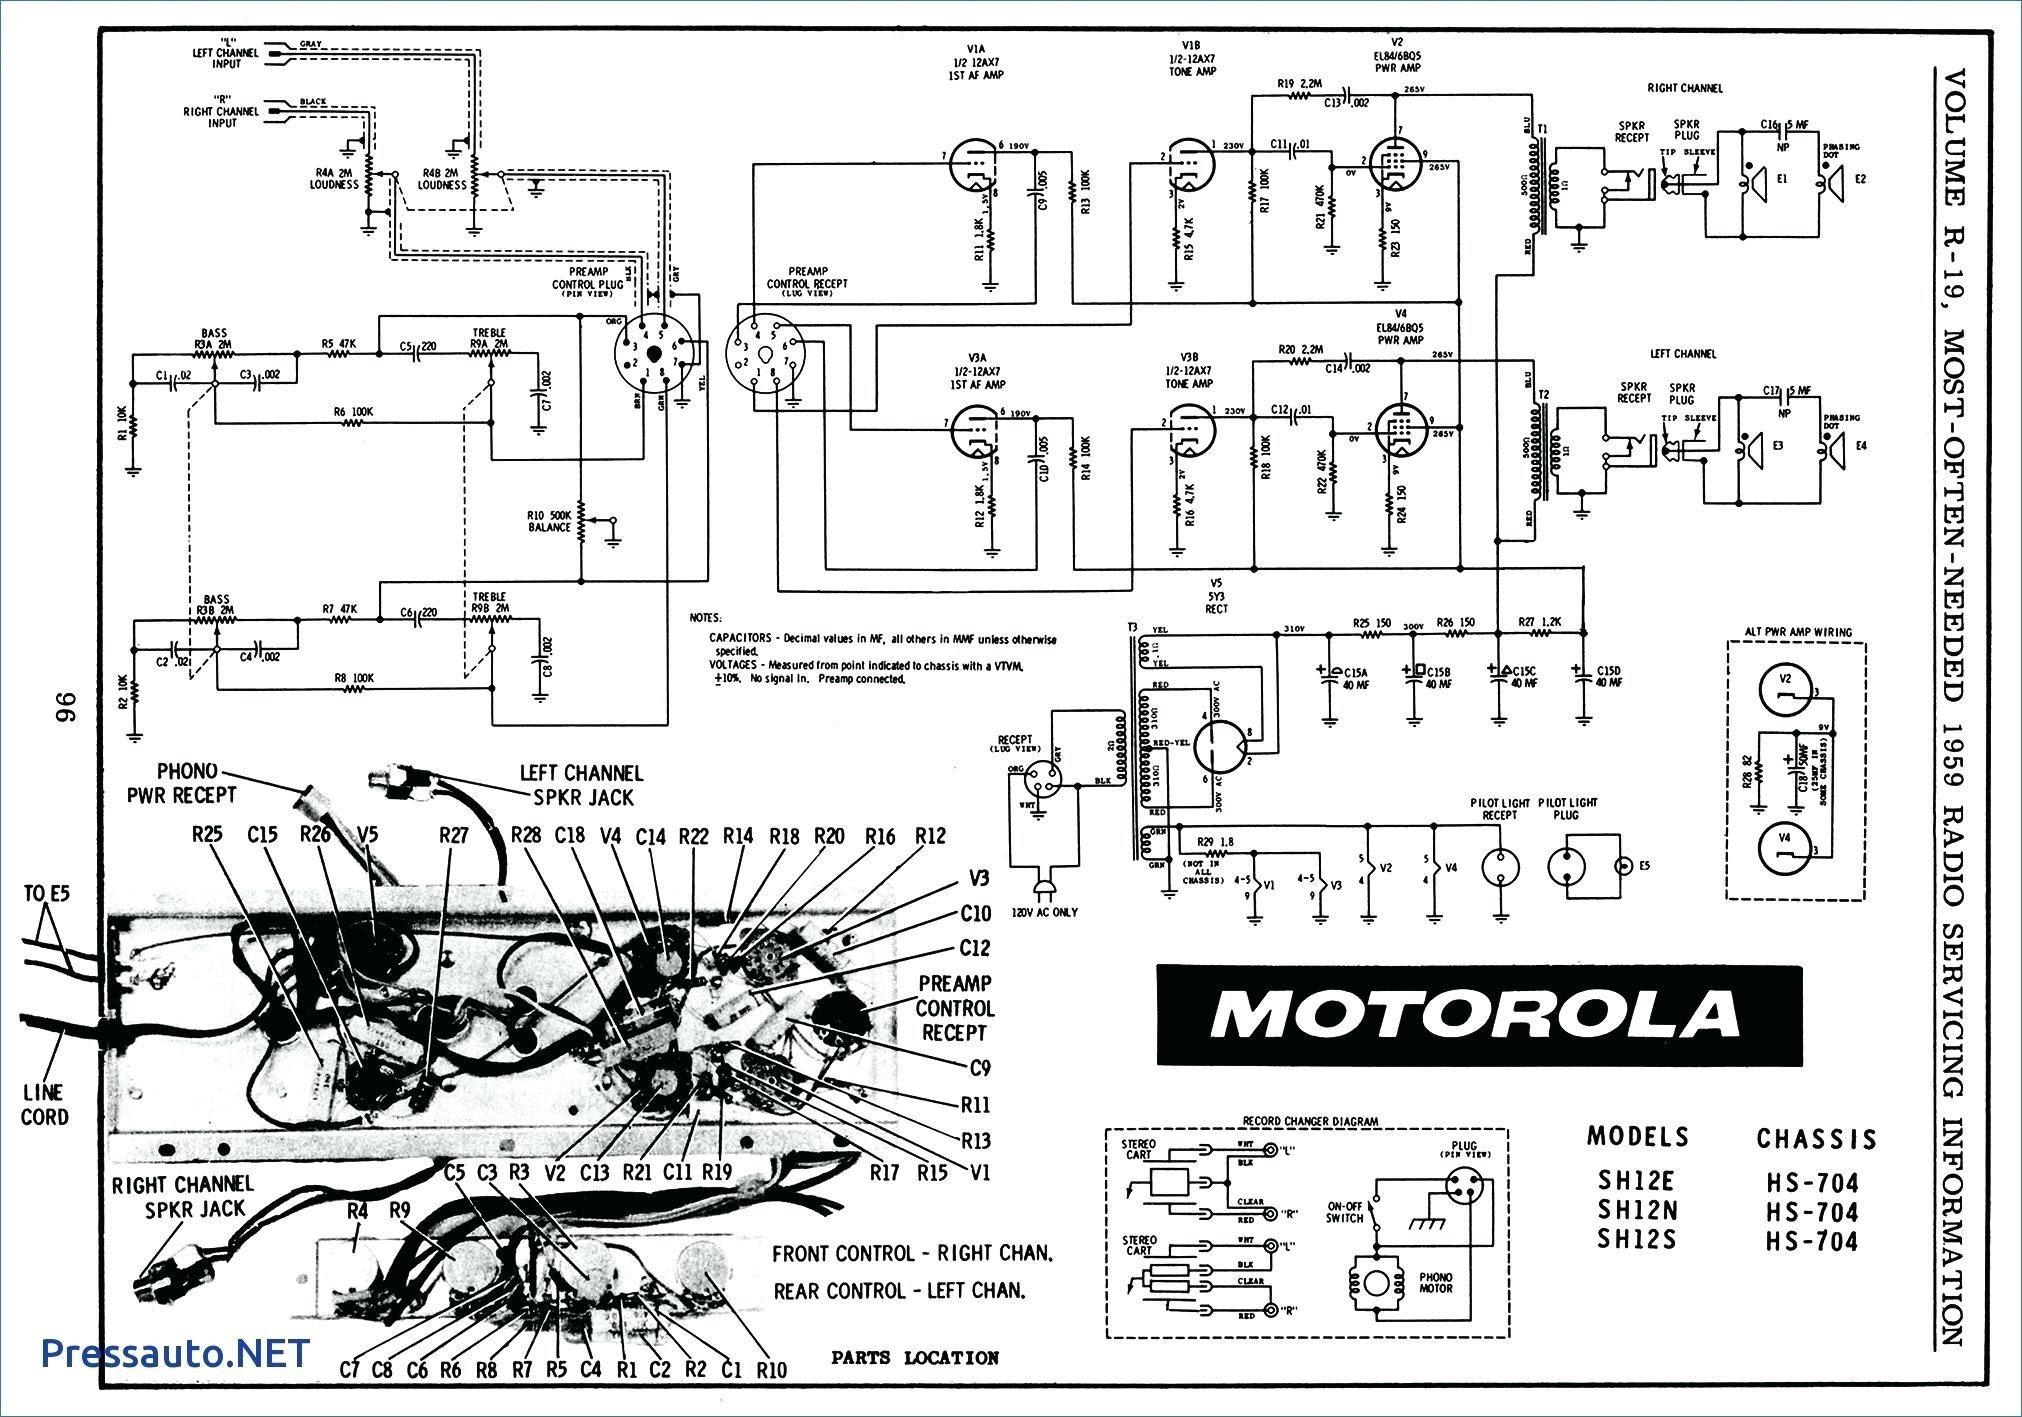 DIAGRAM] Rockford Fosgate 5 Channel Amp Wiring Diagram FULL Version HD  Quality Wiring Diagram - SSTXPWIRING.CONCESSIONARIABELOGISENIGALLIA.ITconcessionariabelogisenigallia.it